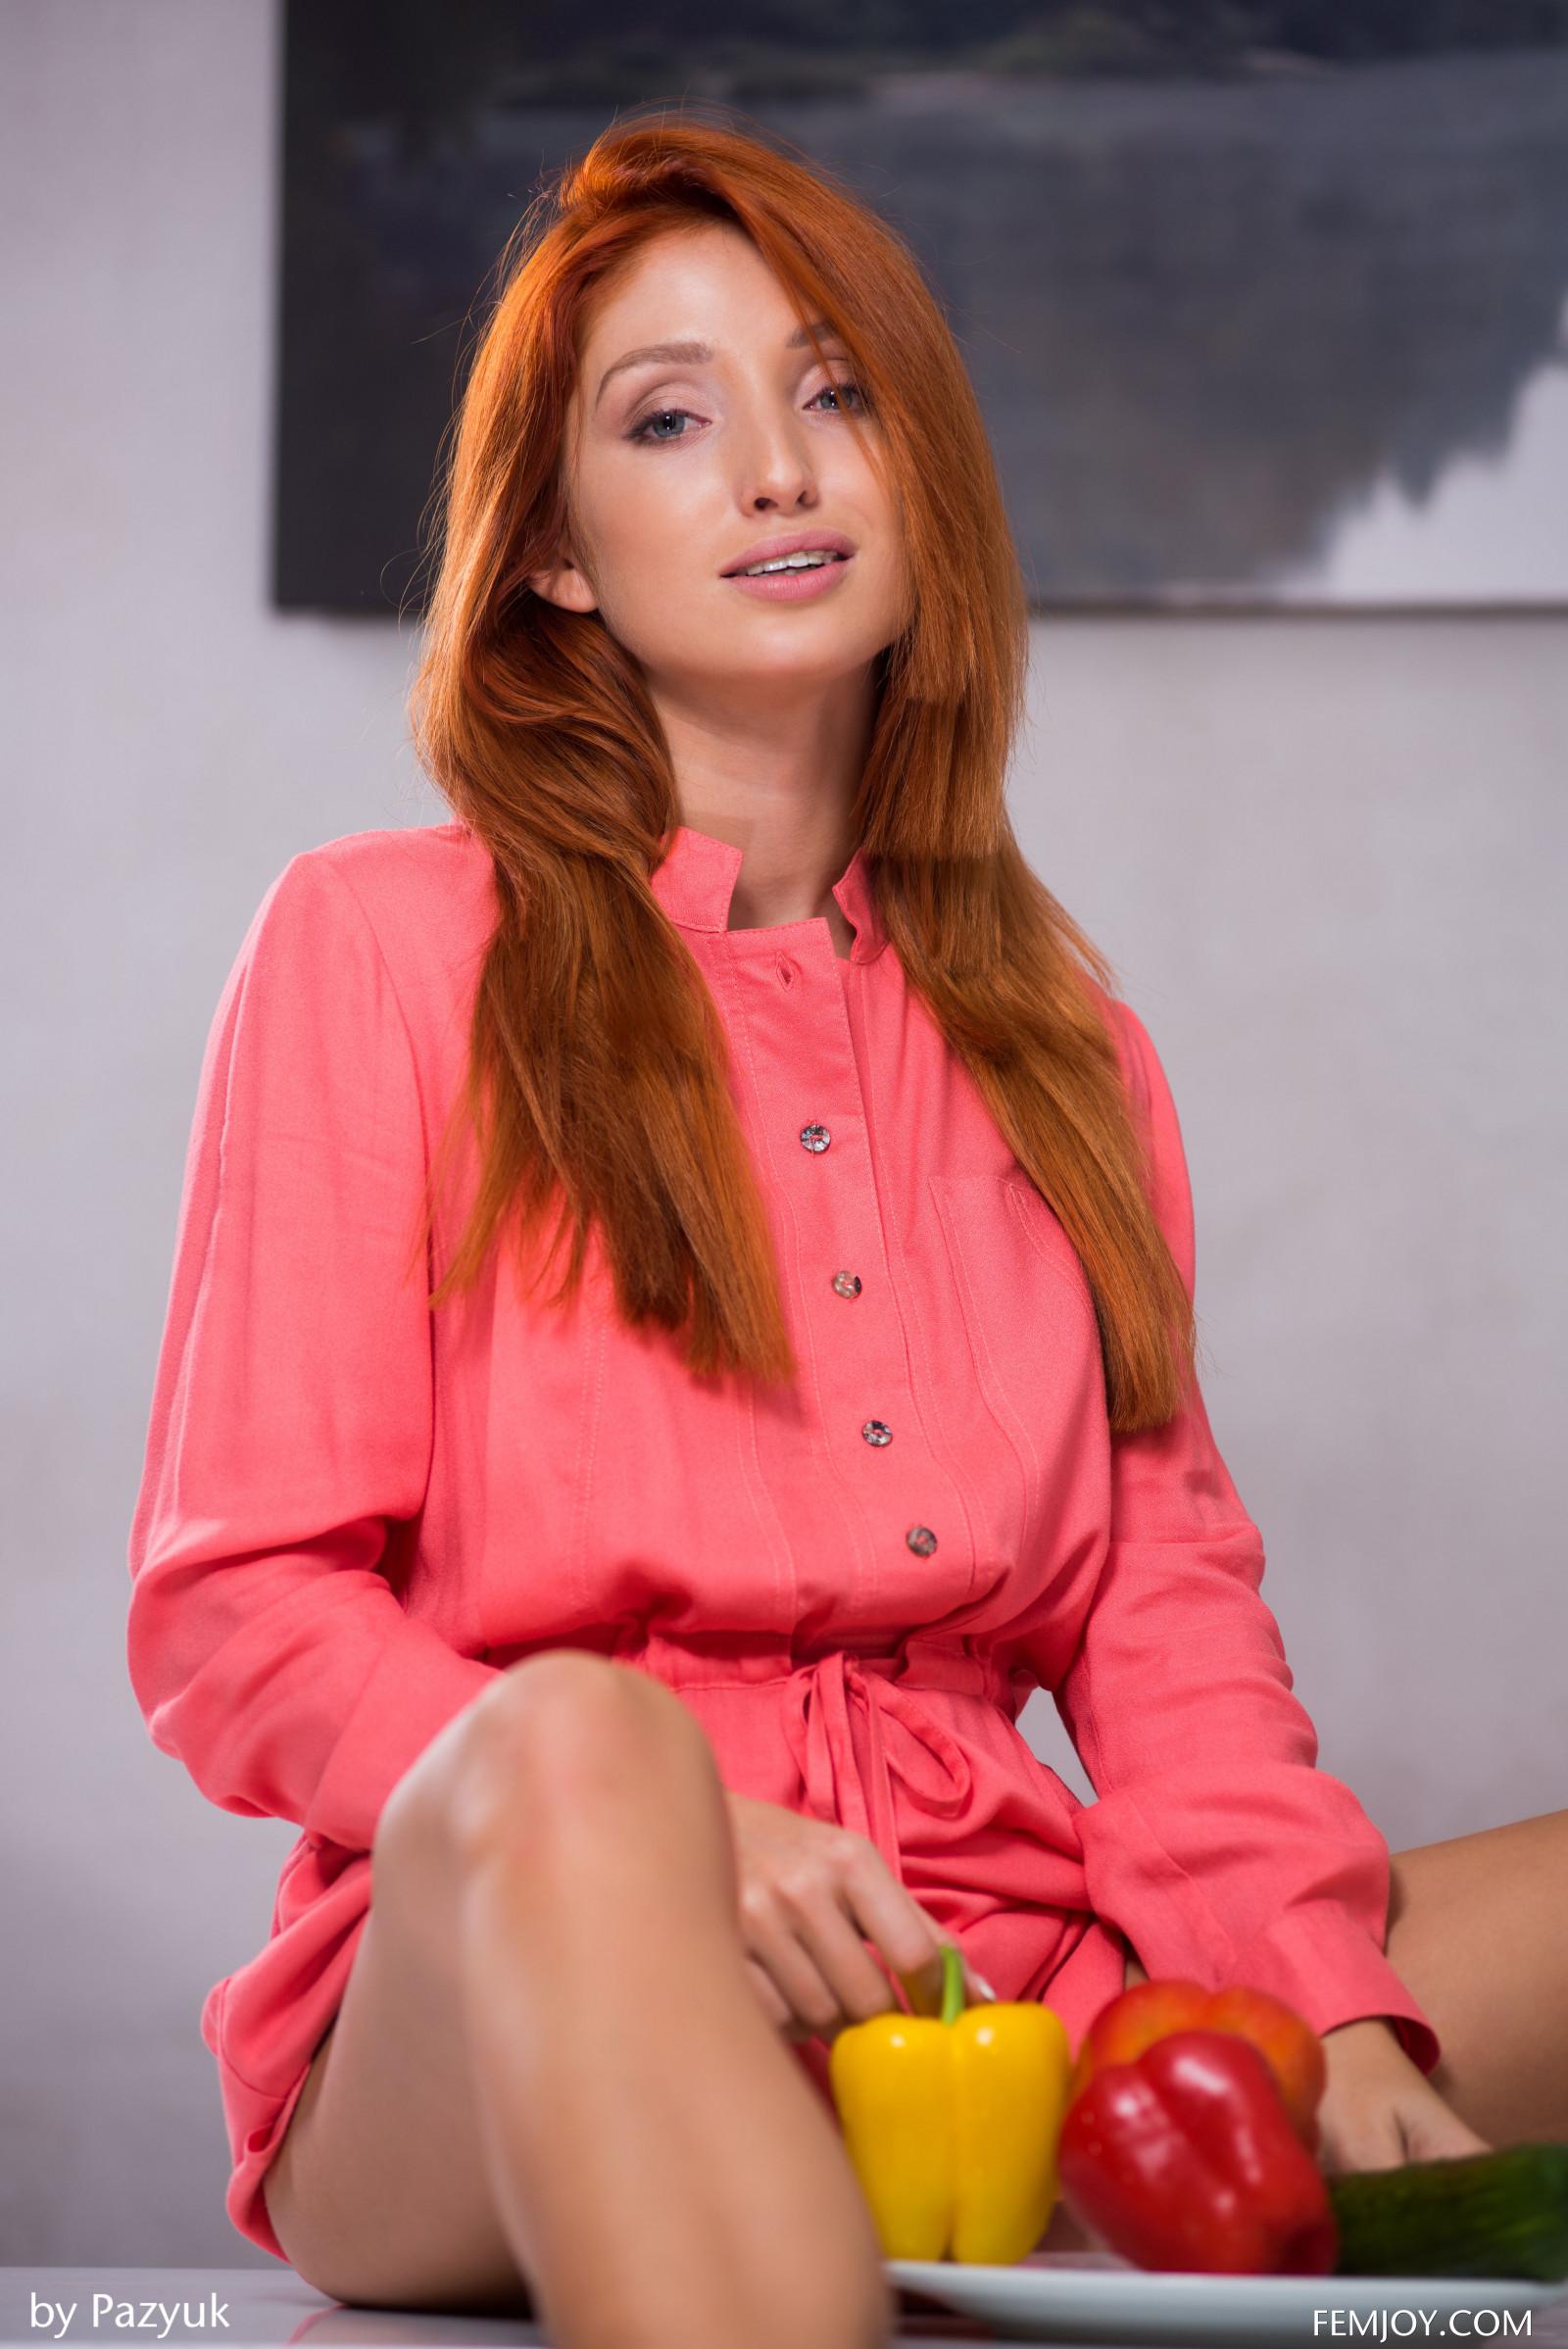 Wallpaper : redhead, Femjoy Magazine, kitchen, table